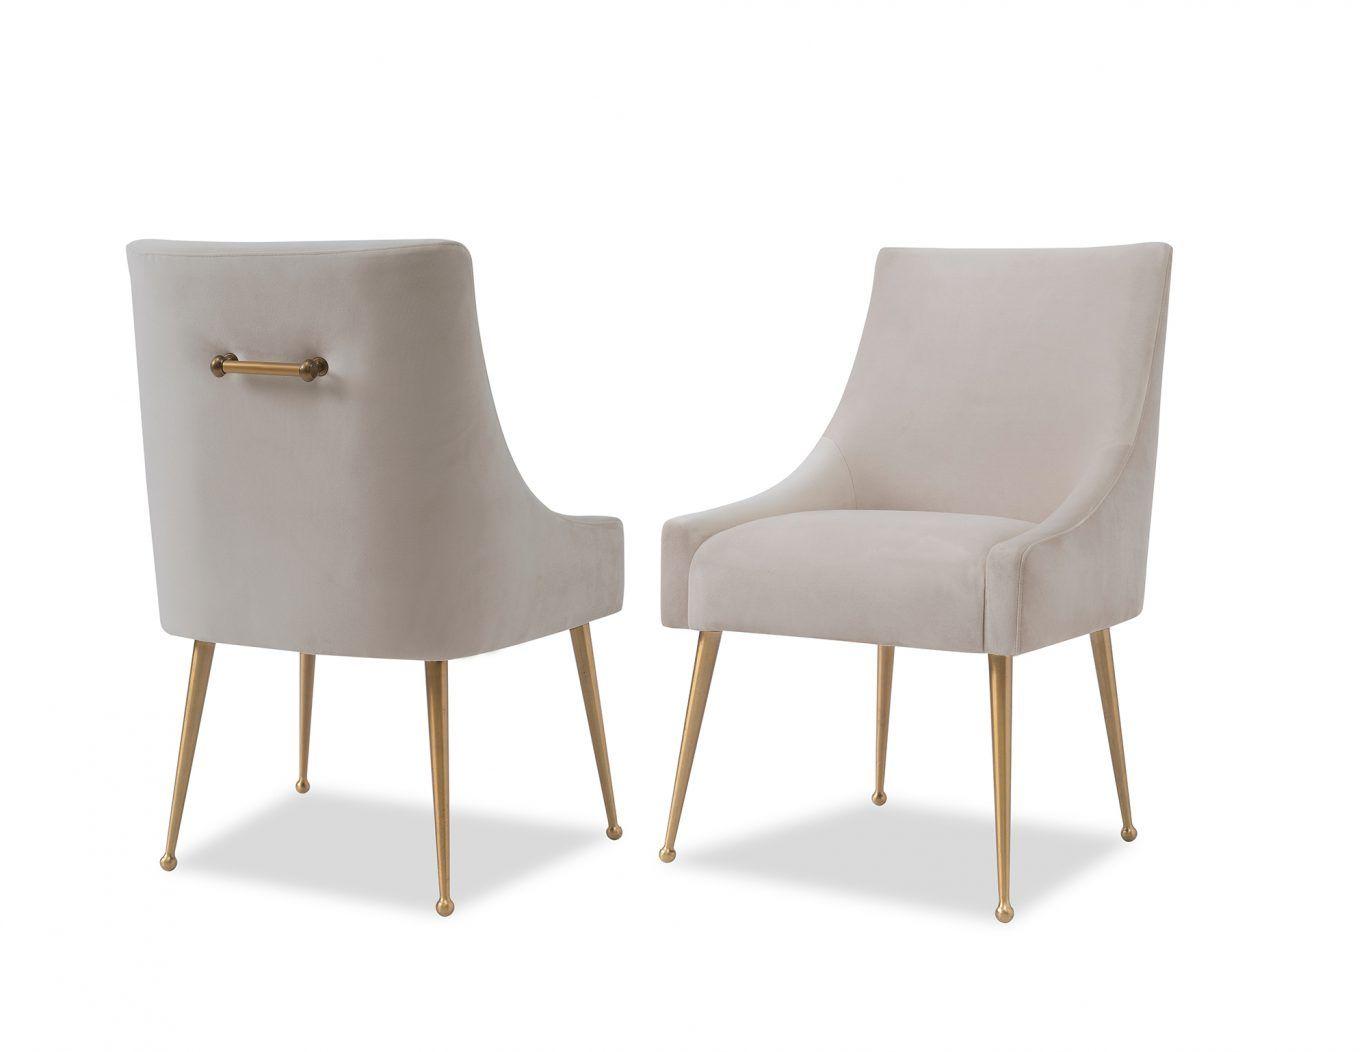 brass dining chair legs